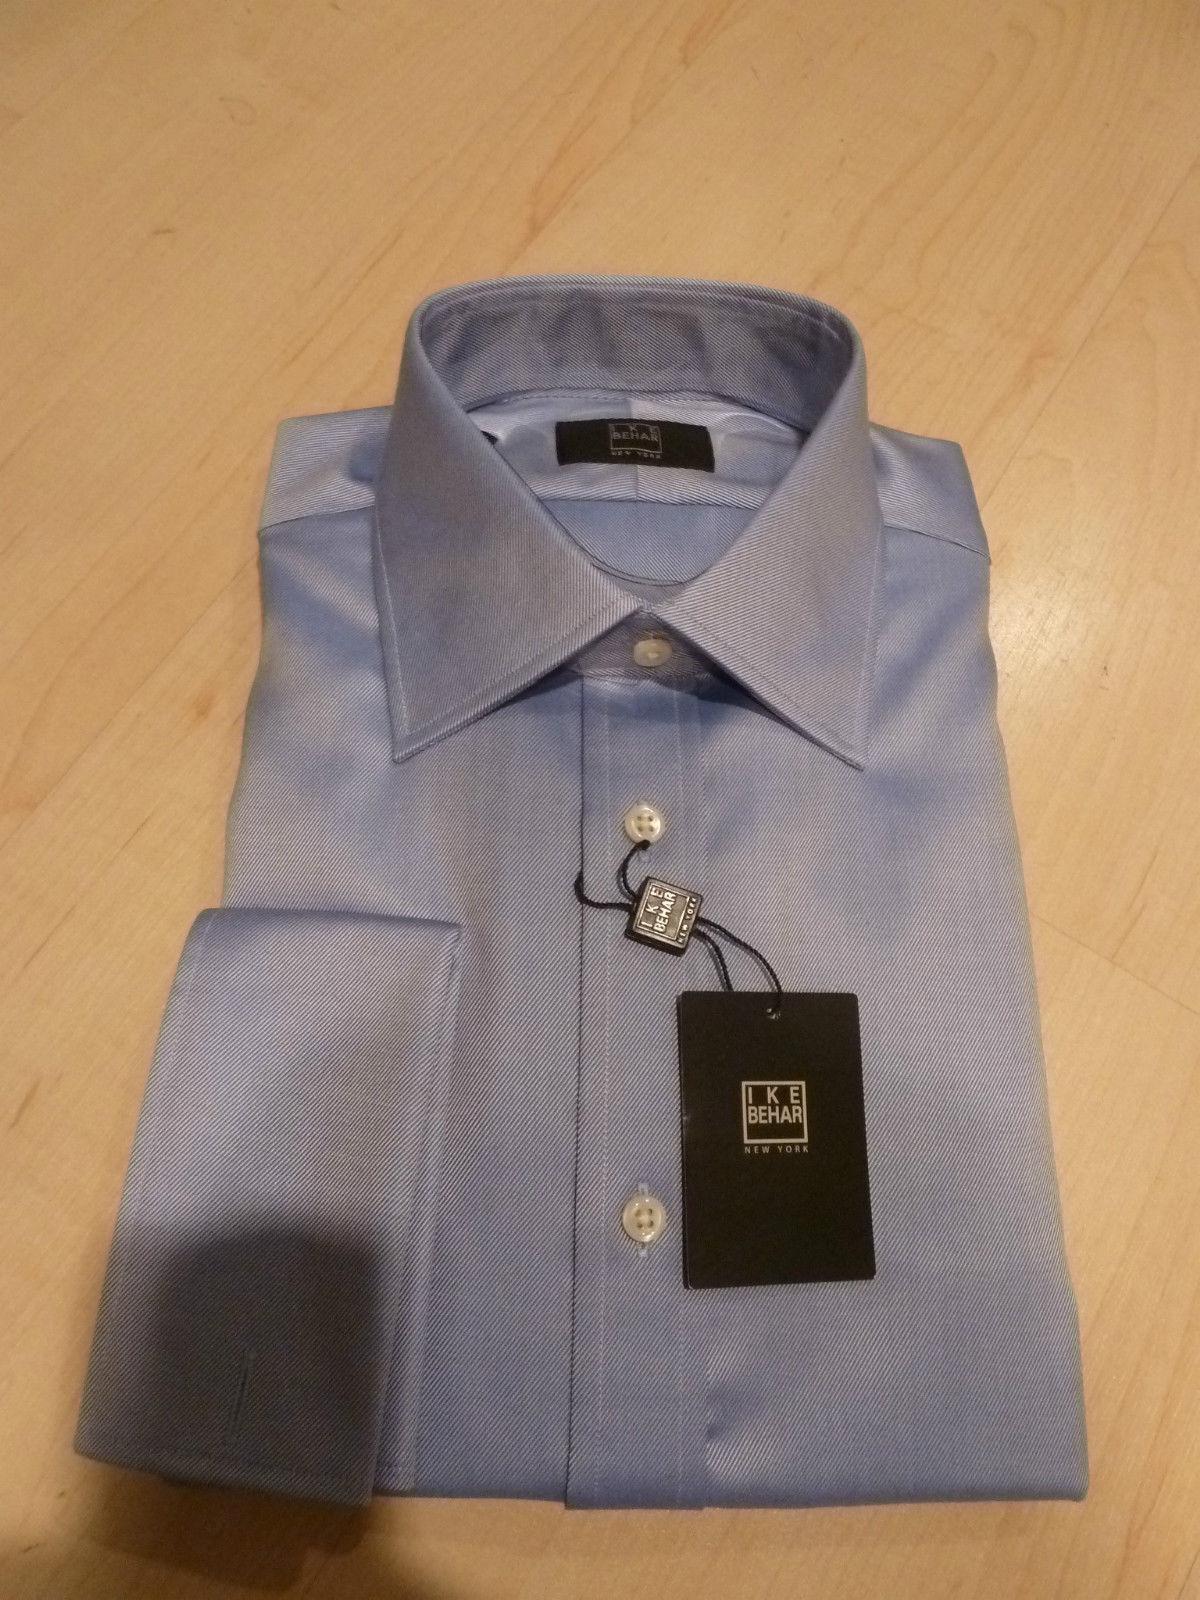 NEW 200+ IKE BEHAR  Herren Dress SHIRT 15 34 Solid Blau 100% Cotton FC